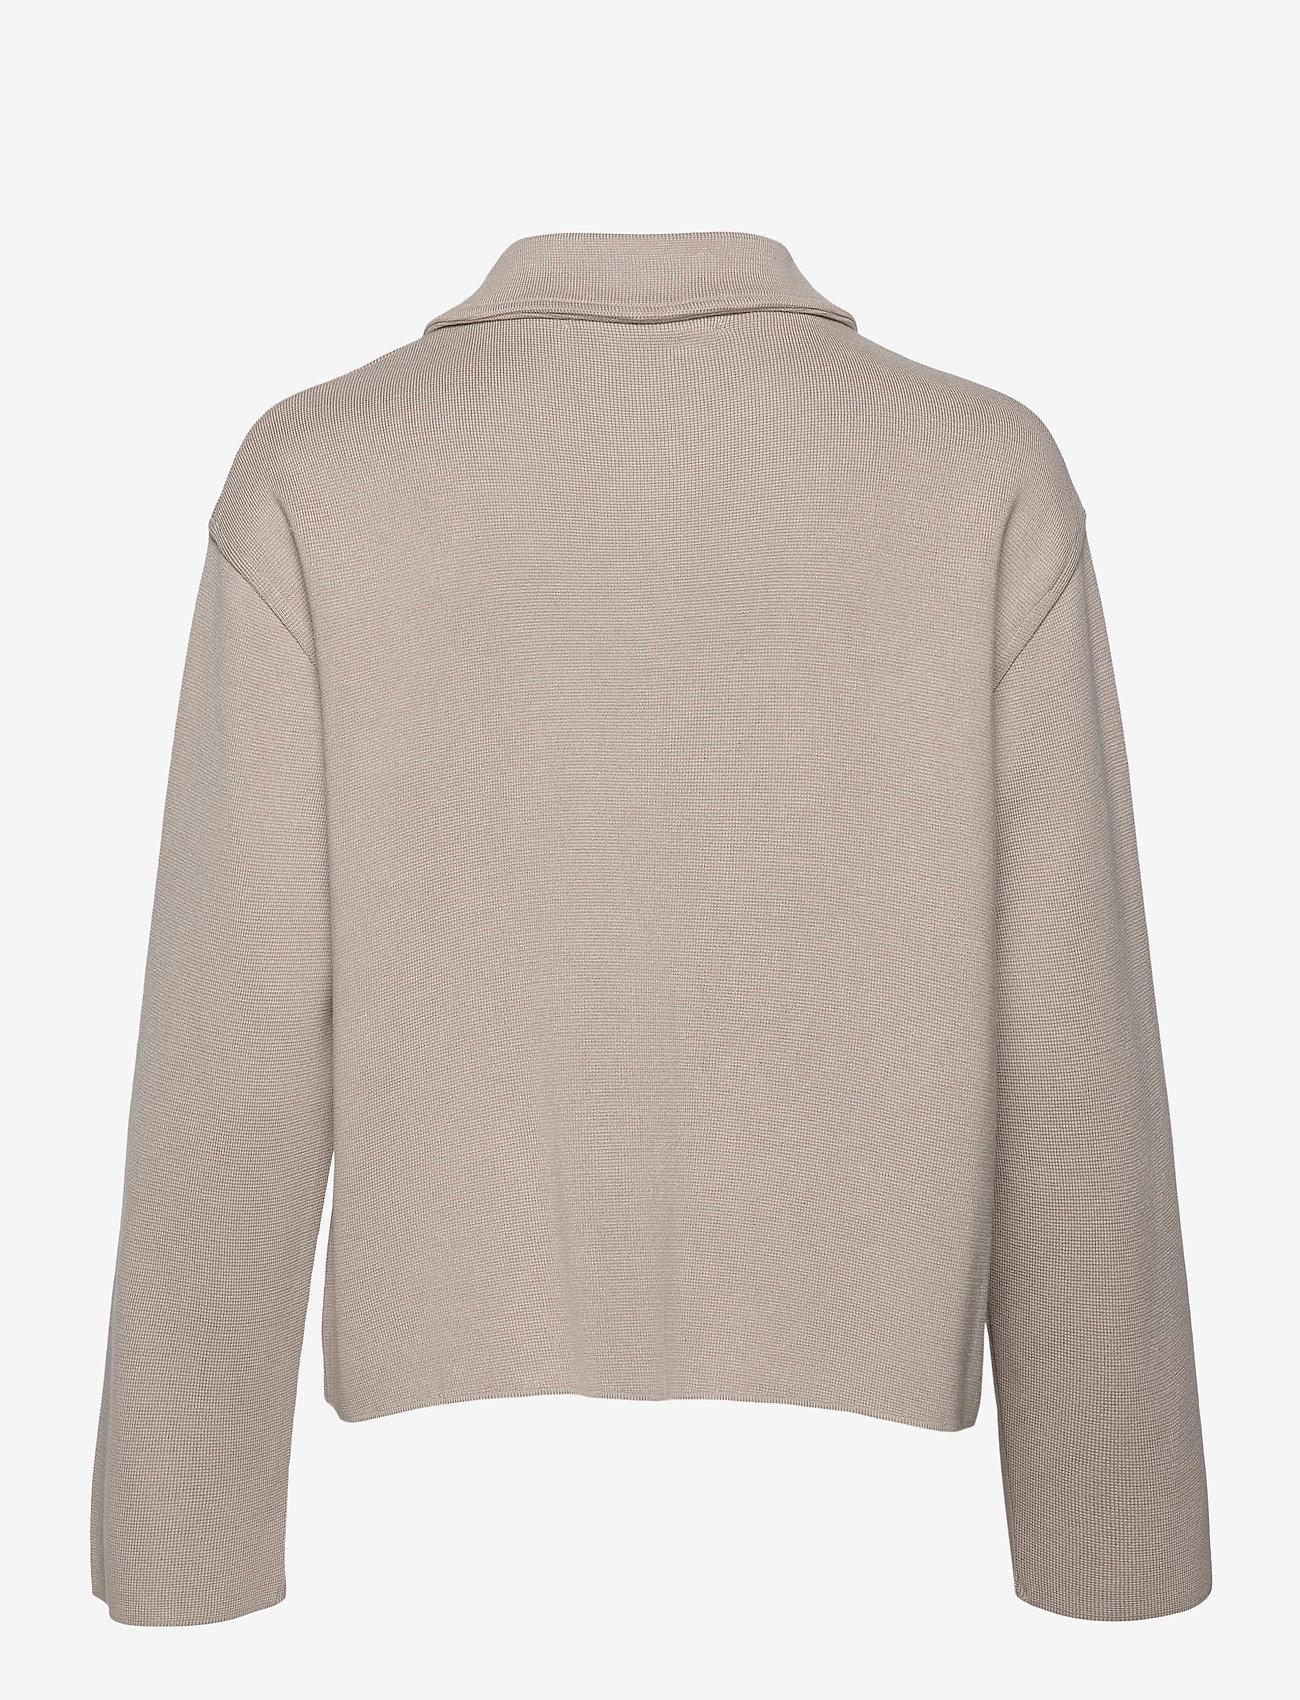 BUSNEL - Nina jacket - wool jackets - sand - 1